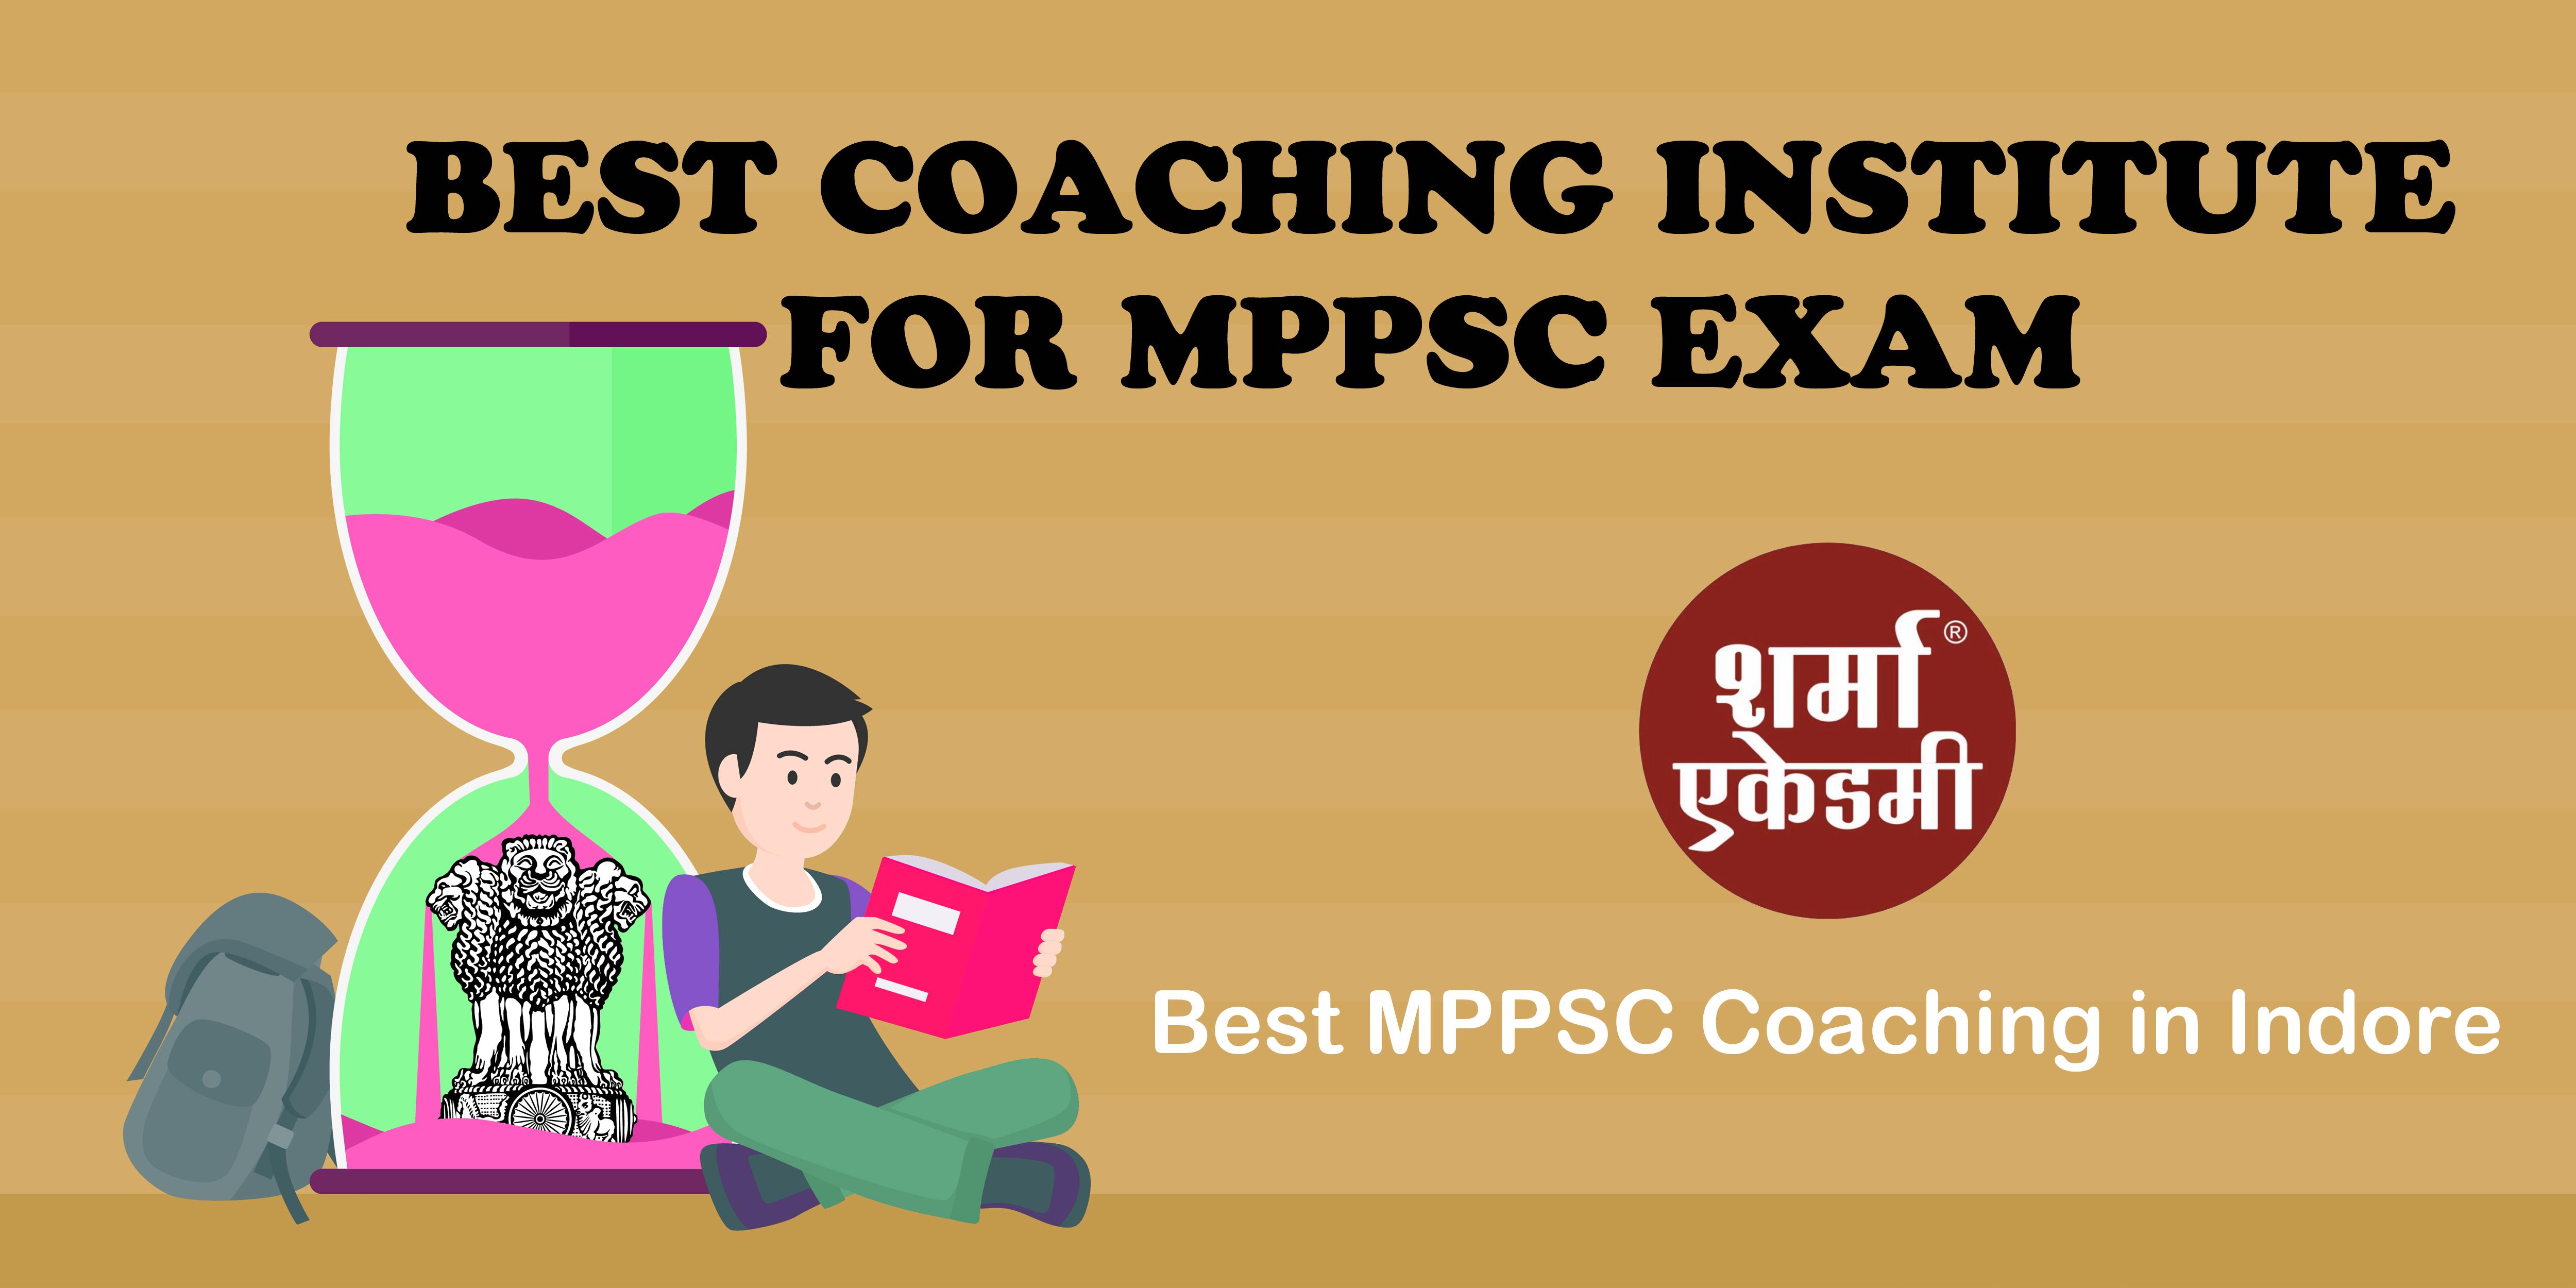 Best Coaching Institute For MPPSC Exam